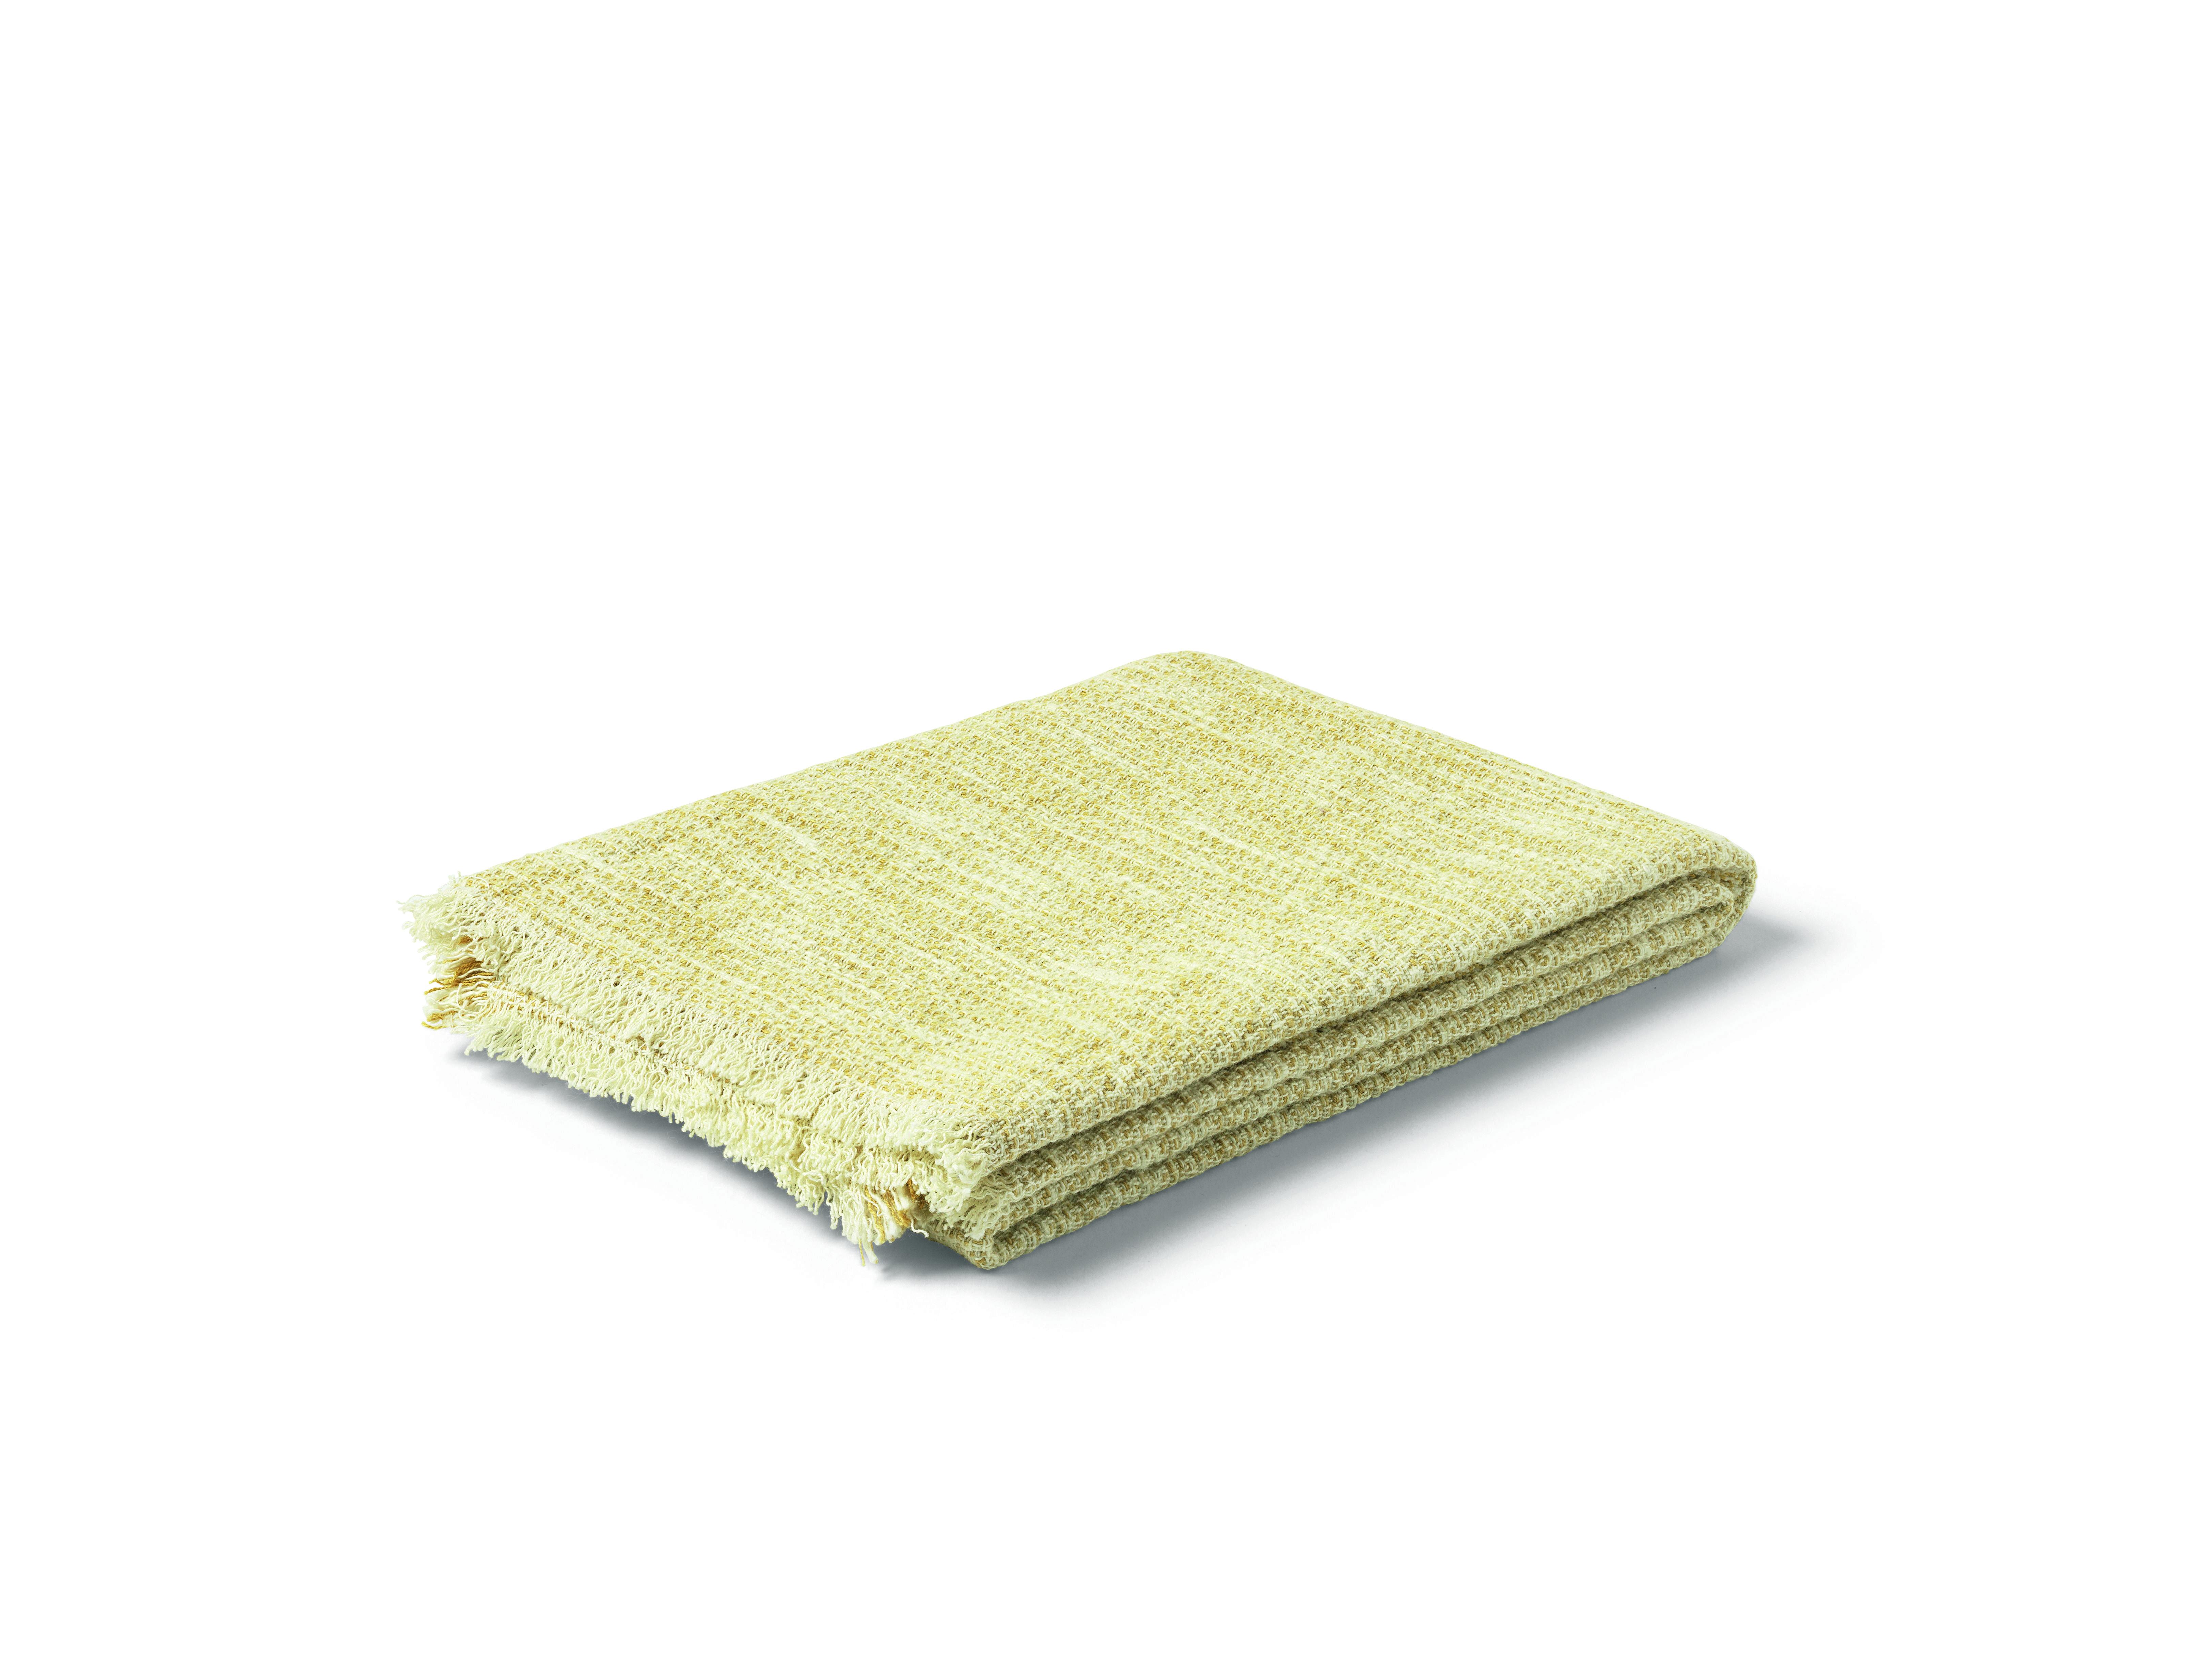 Juna Reflection håndklæde, 50x100 cm, sennep